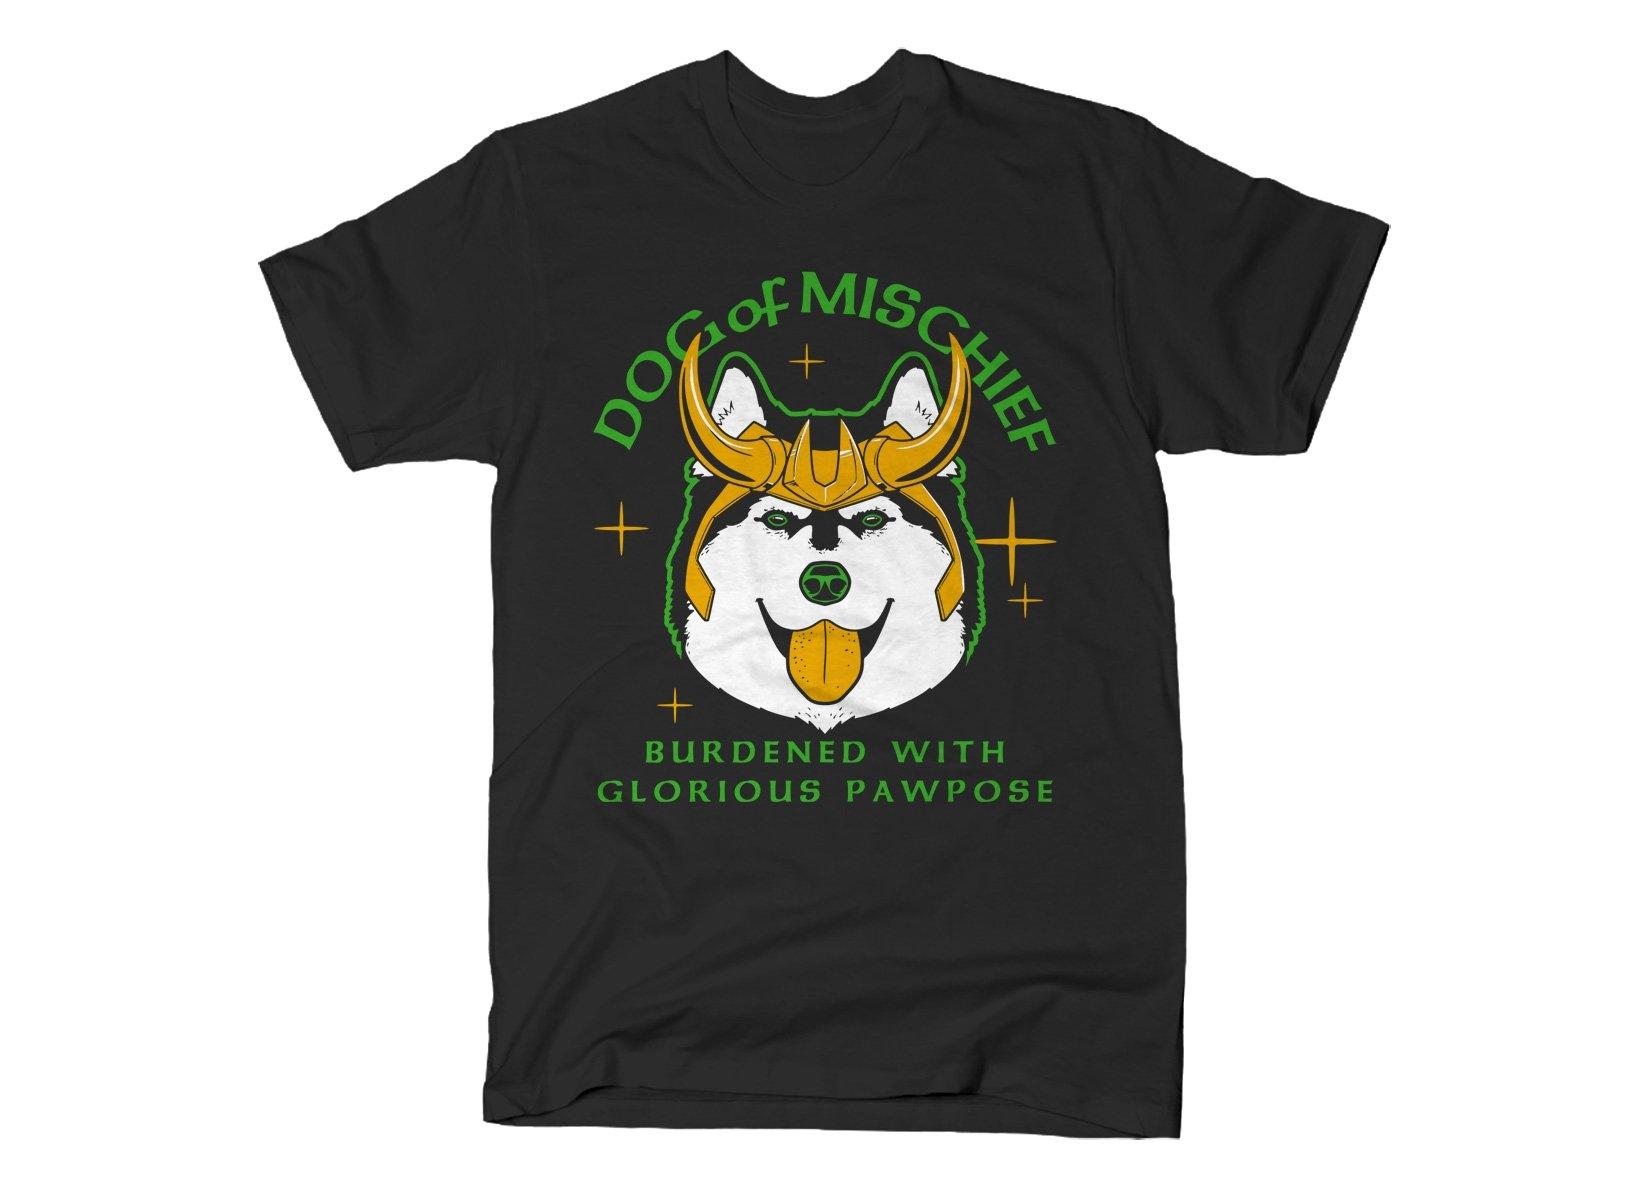 Dog Of Mischief on Mens T-Shirt